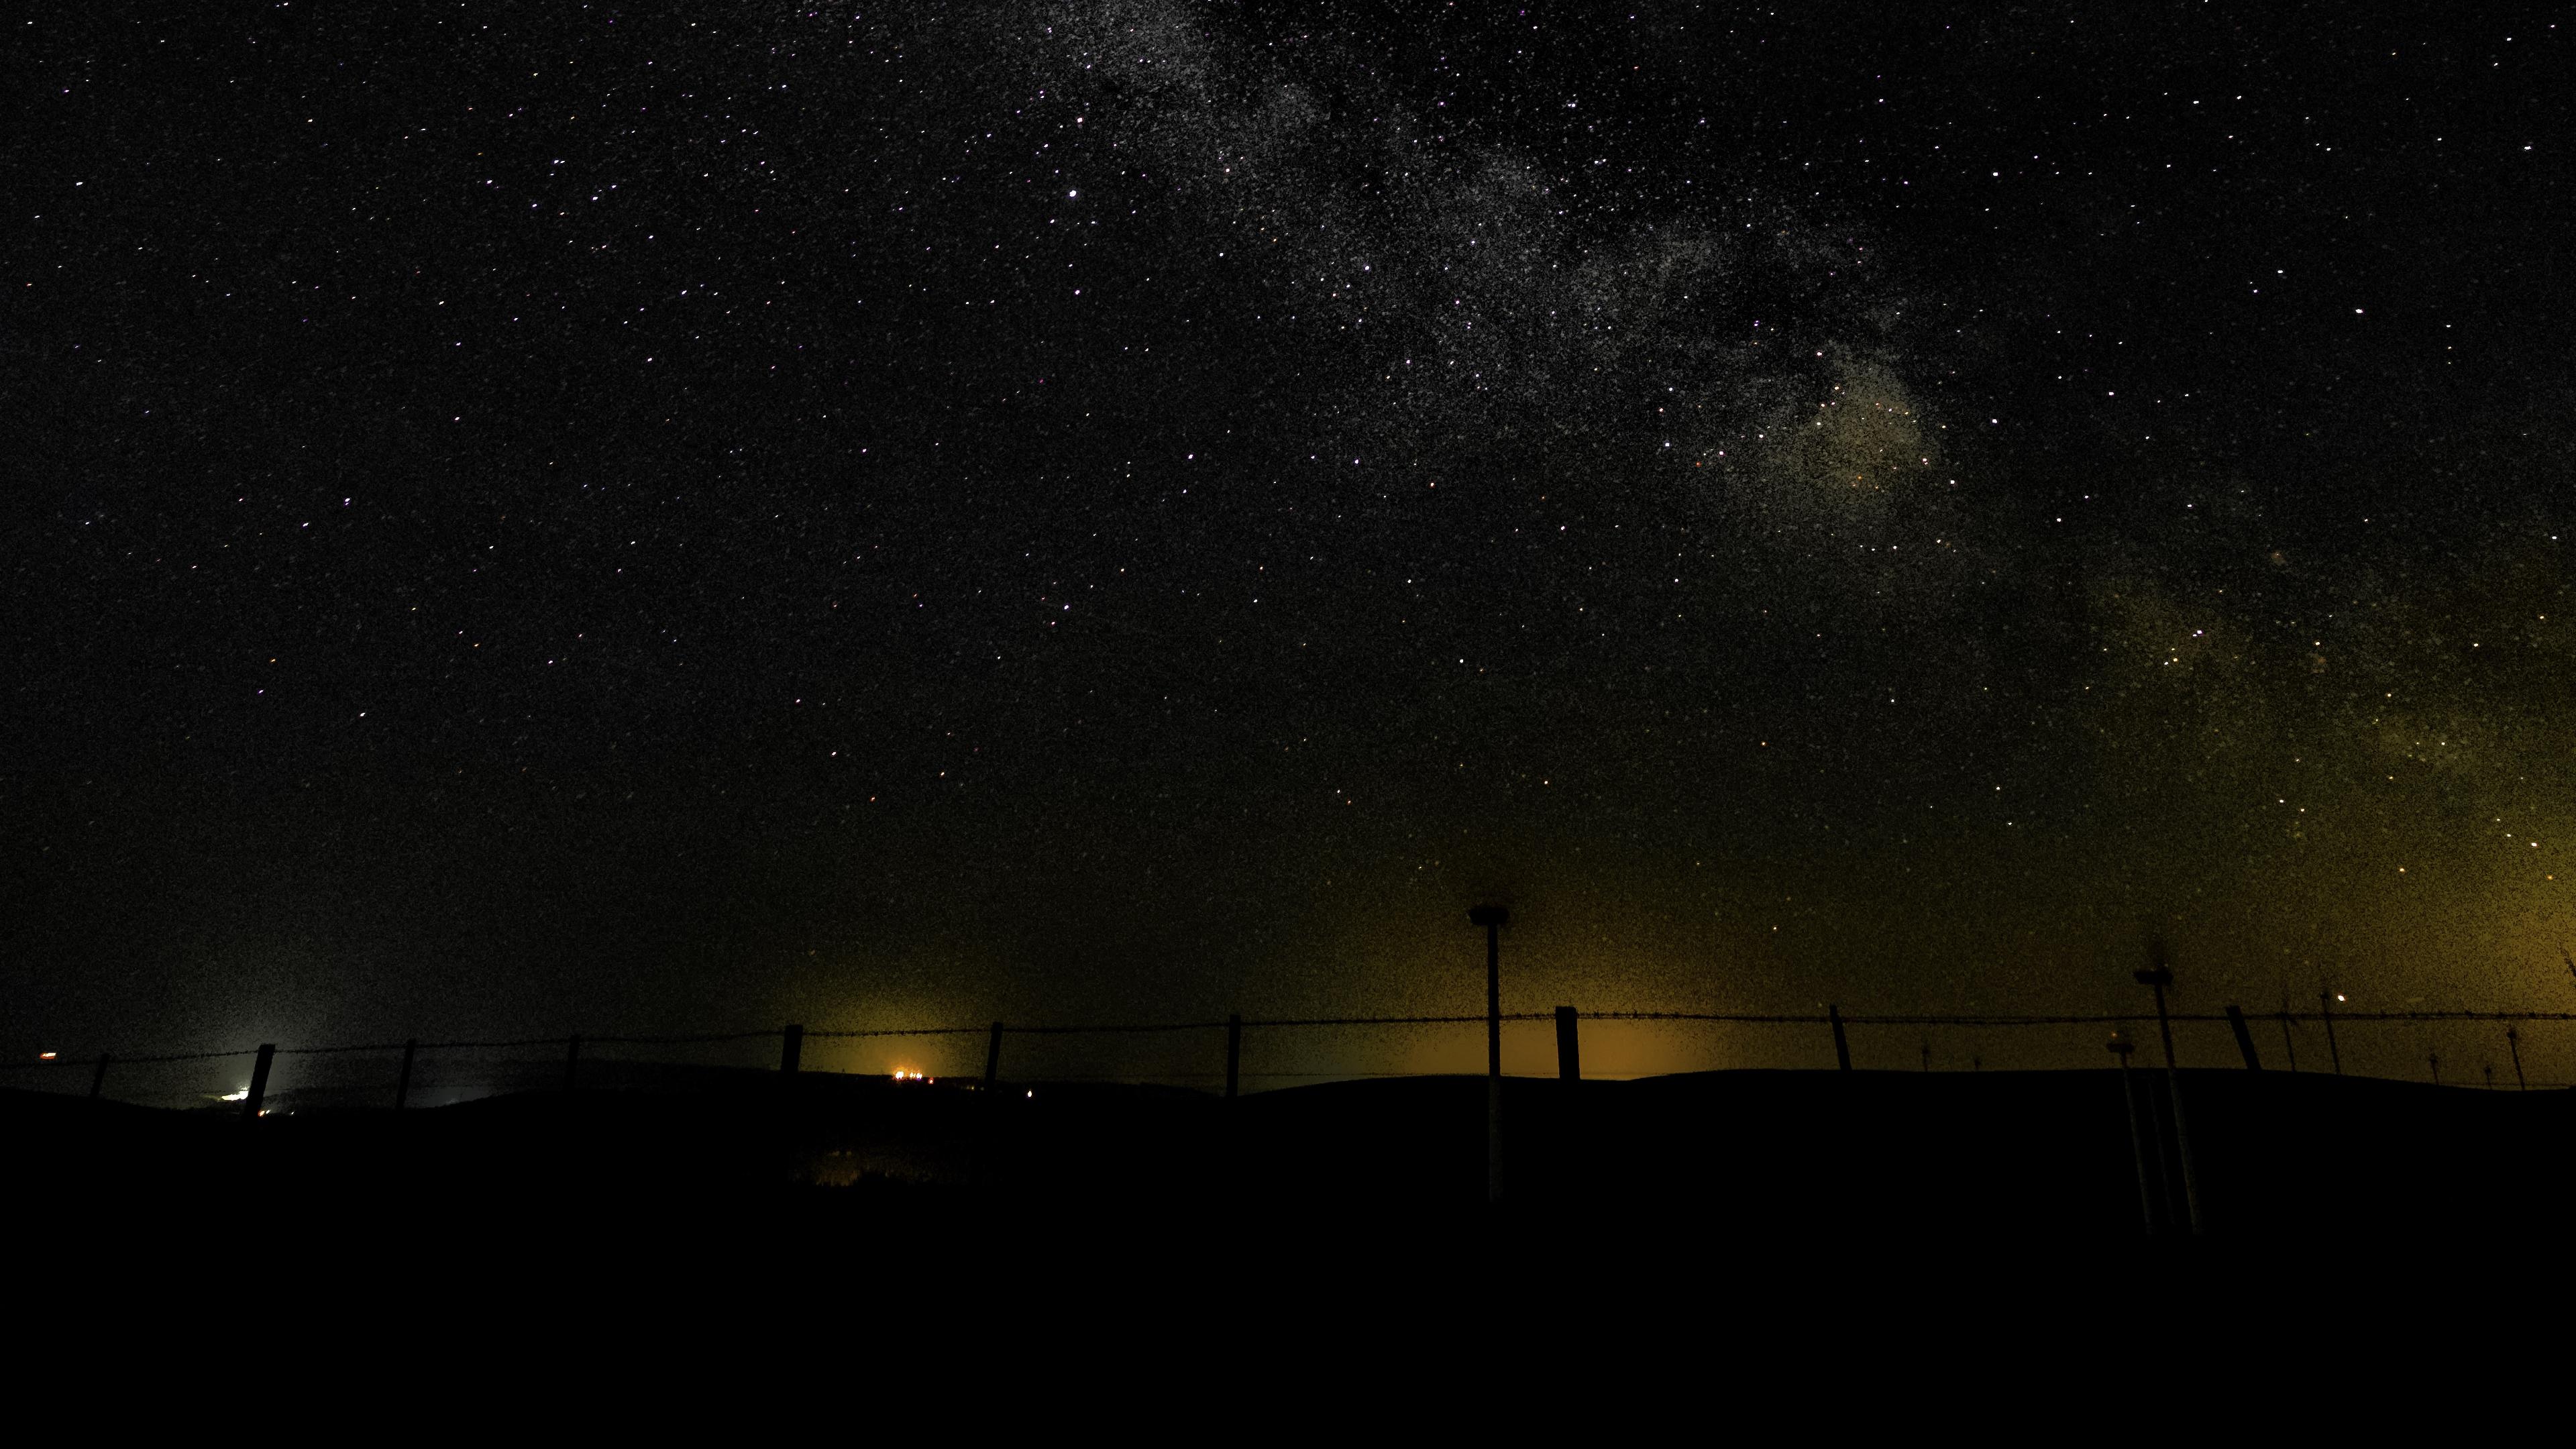 milky way starry sky night horizon radiance 4k 1540576102 - milky way, starry sky, night, horizon, radiance 4k - starry sky, Night, milky way